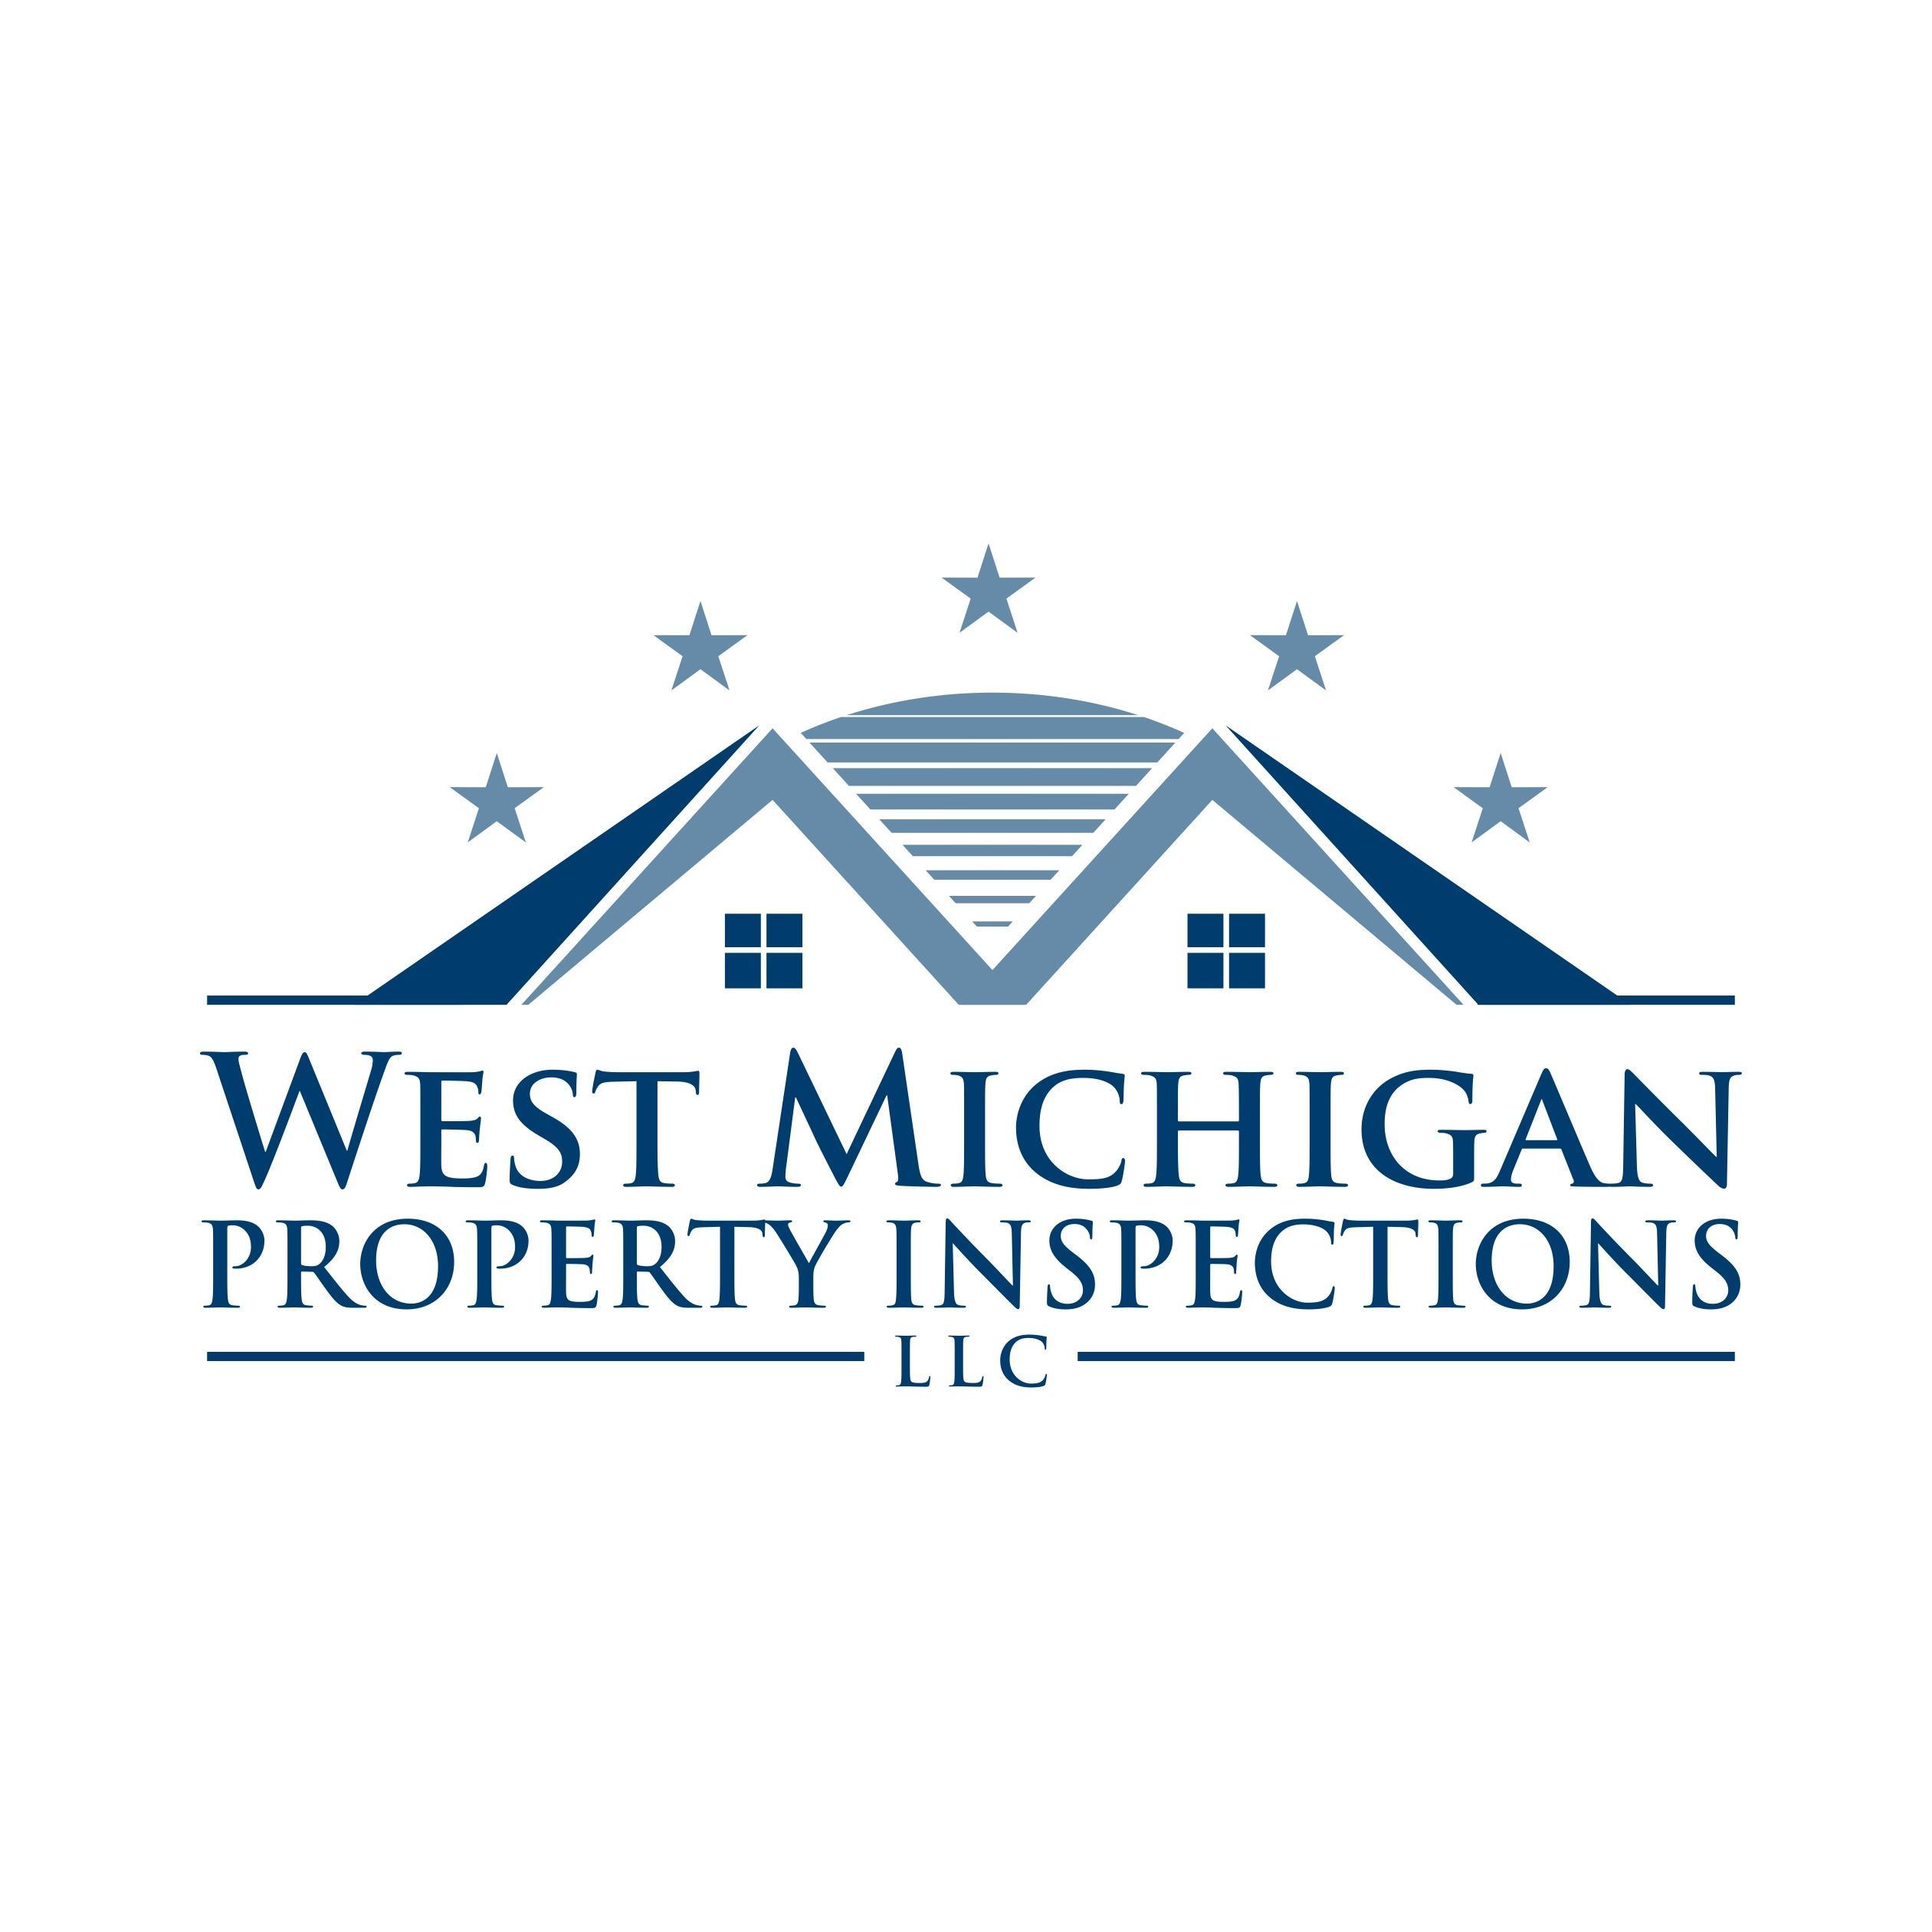 West Michigan Property Inspections LLC